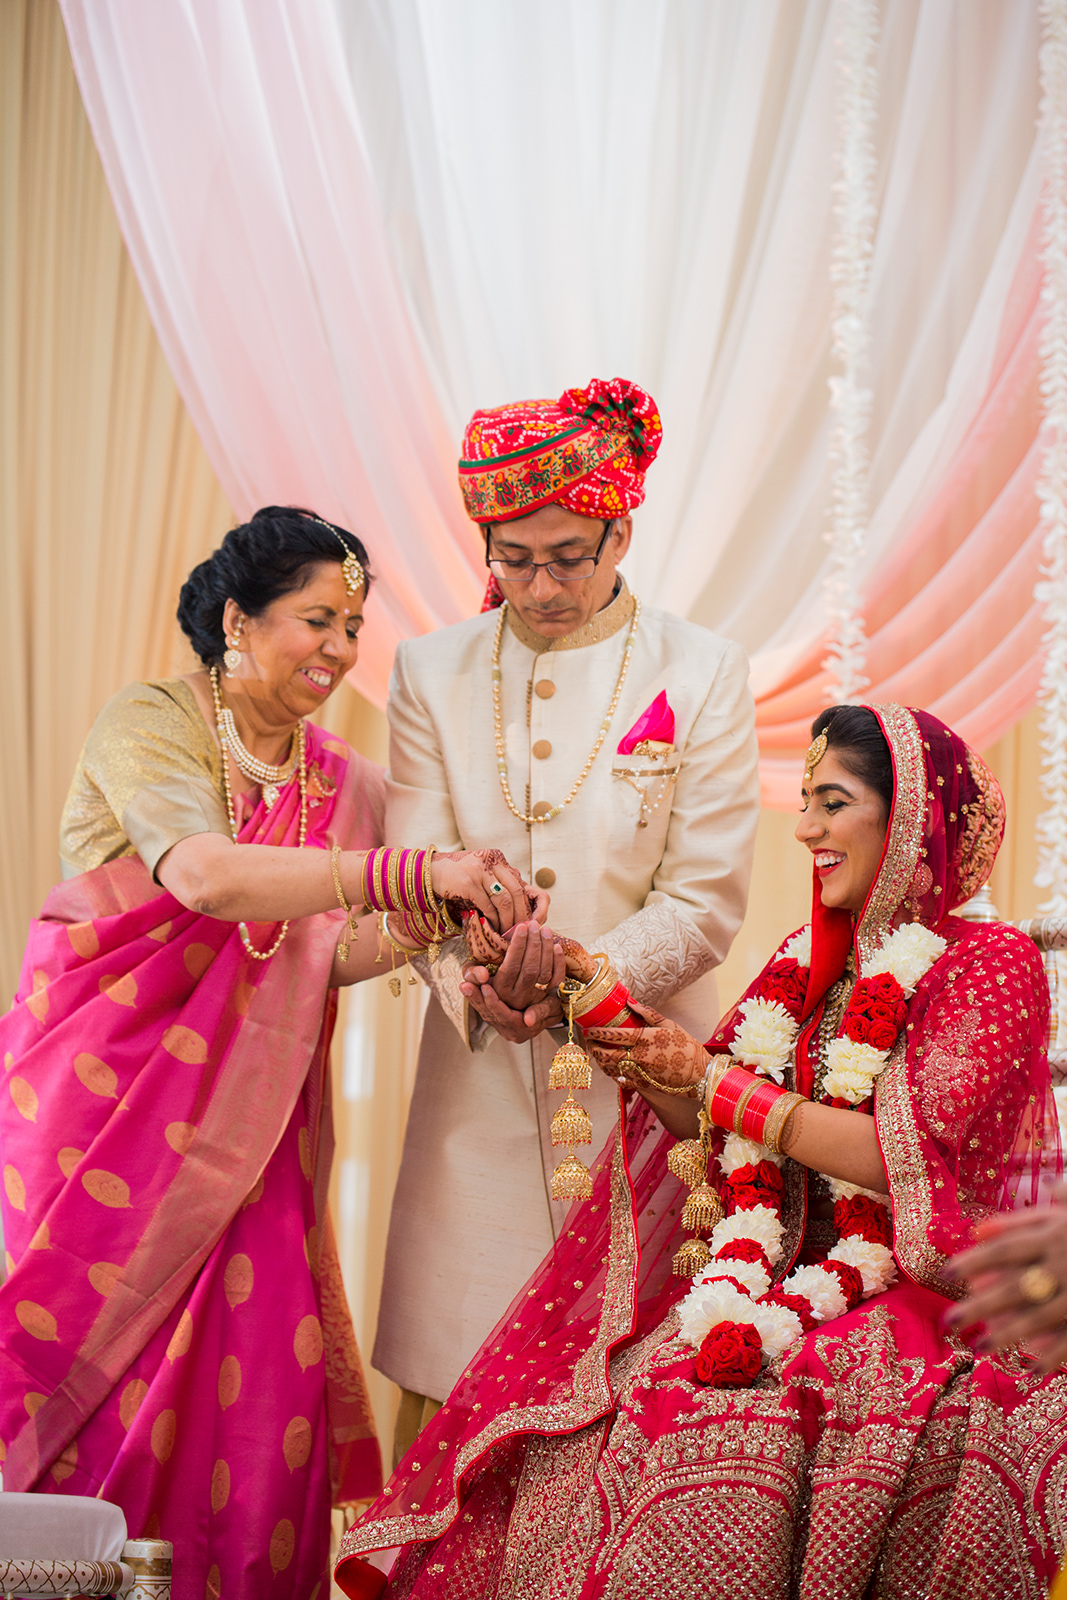 Le Cape Weddings - Sumeet and Chavi - Ceremony --33.jpg